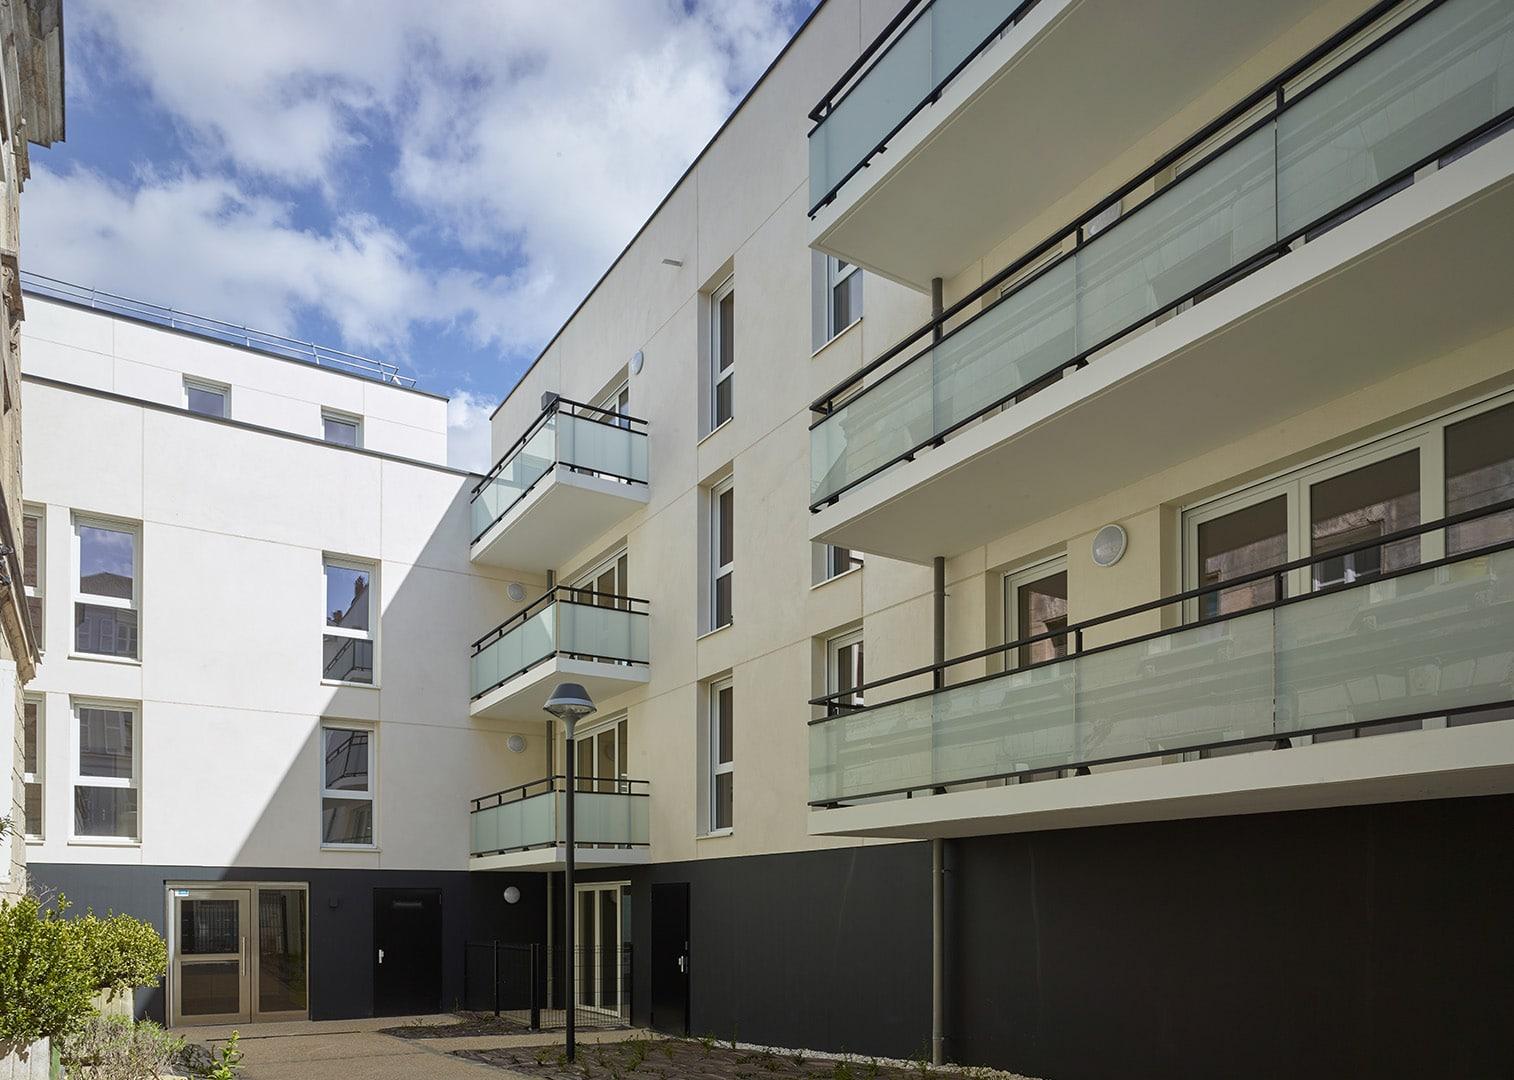 residence-de-la-madeleine-cba-rouen-2